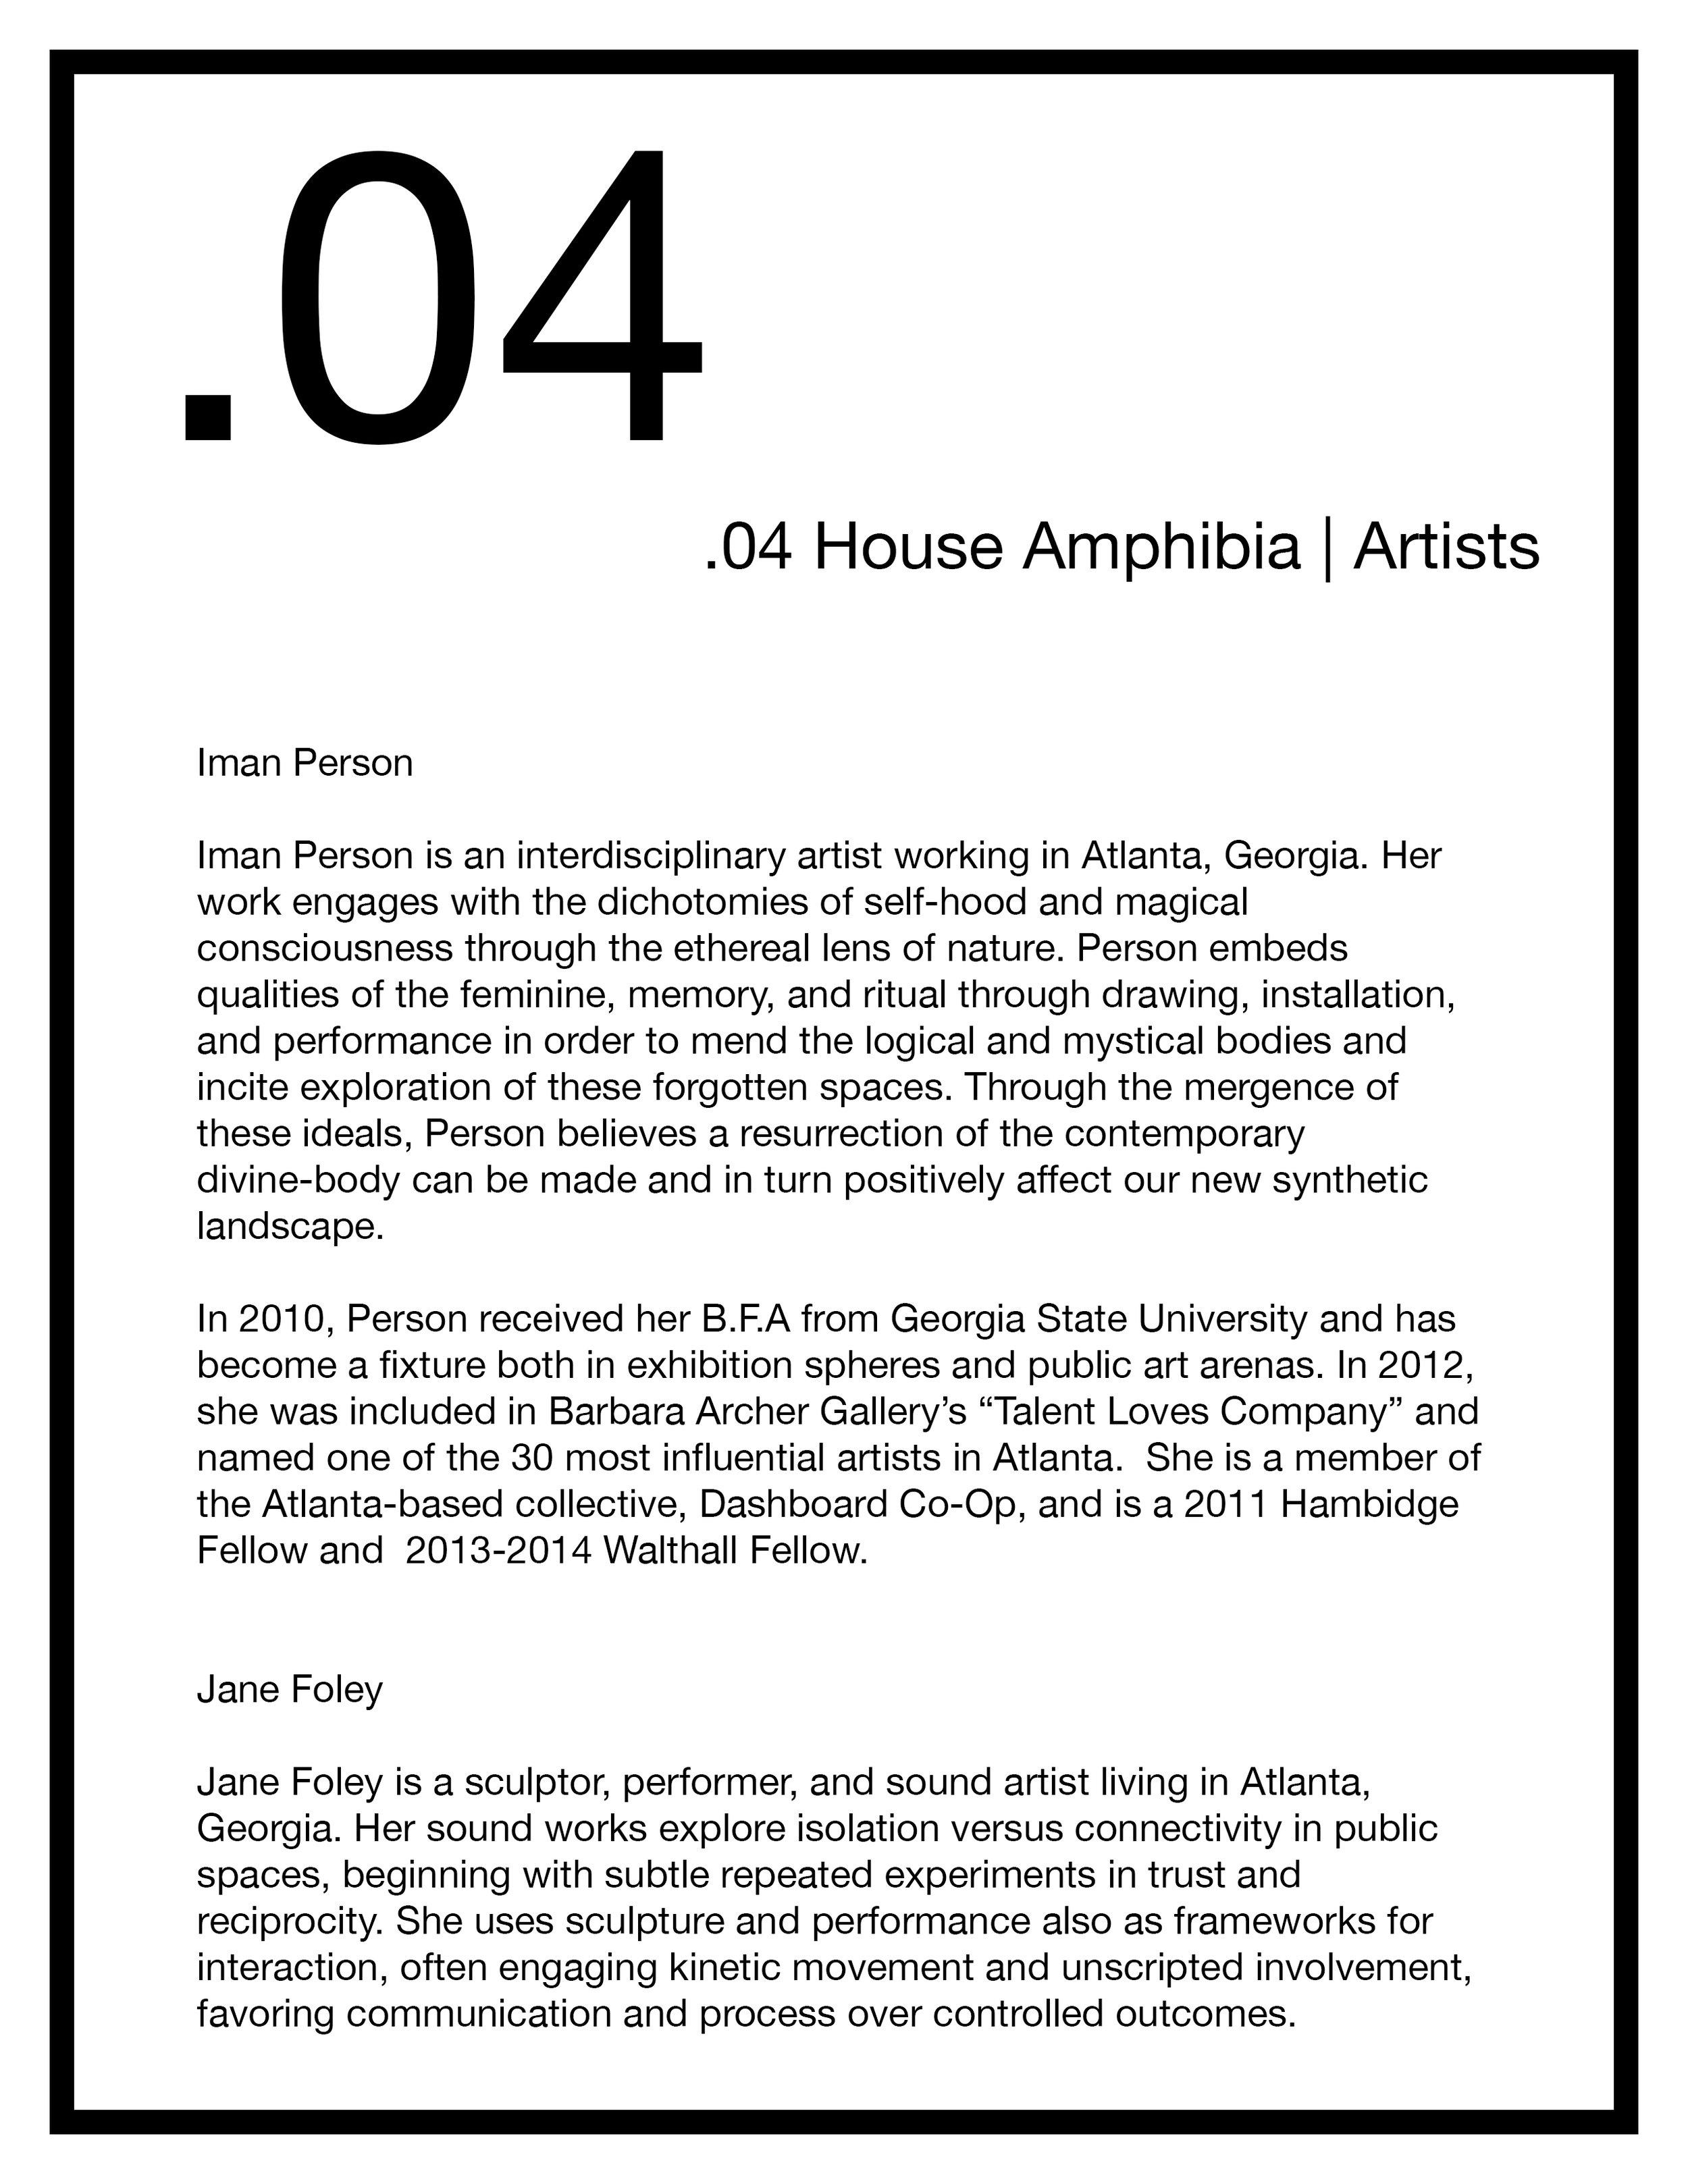 557 house bios 1.jpg